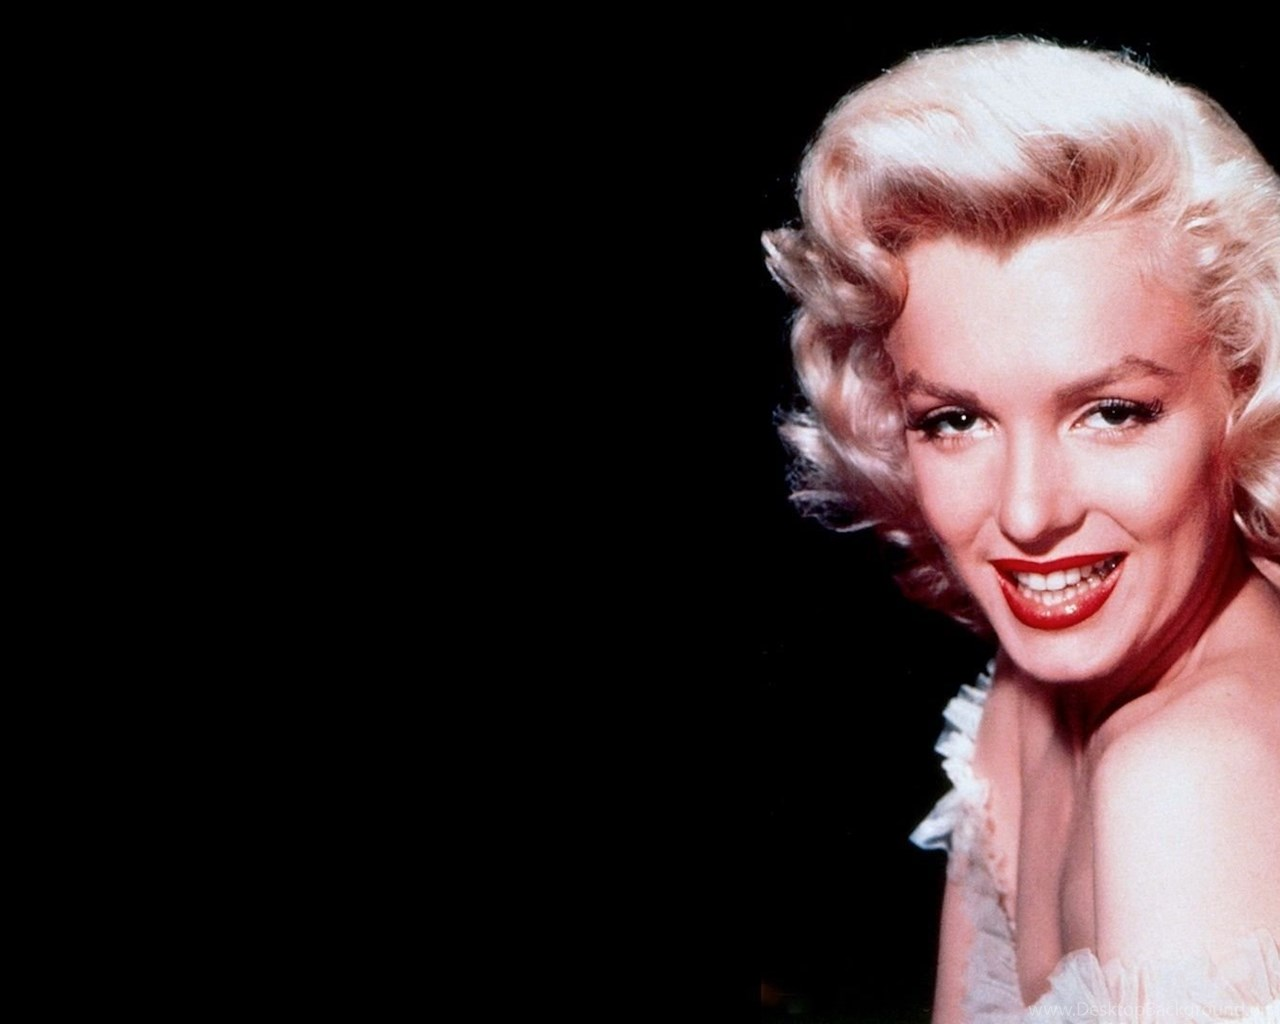 Full hd 1080p marilyn monroe wallpapers hd desktop backgrounds desktop background - Marilyn monroe wallpaper download ...